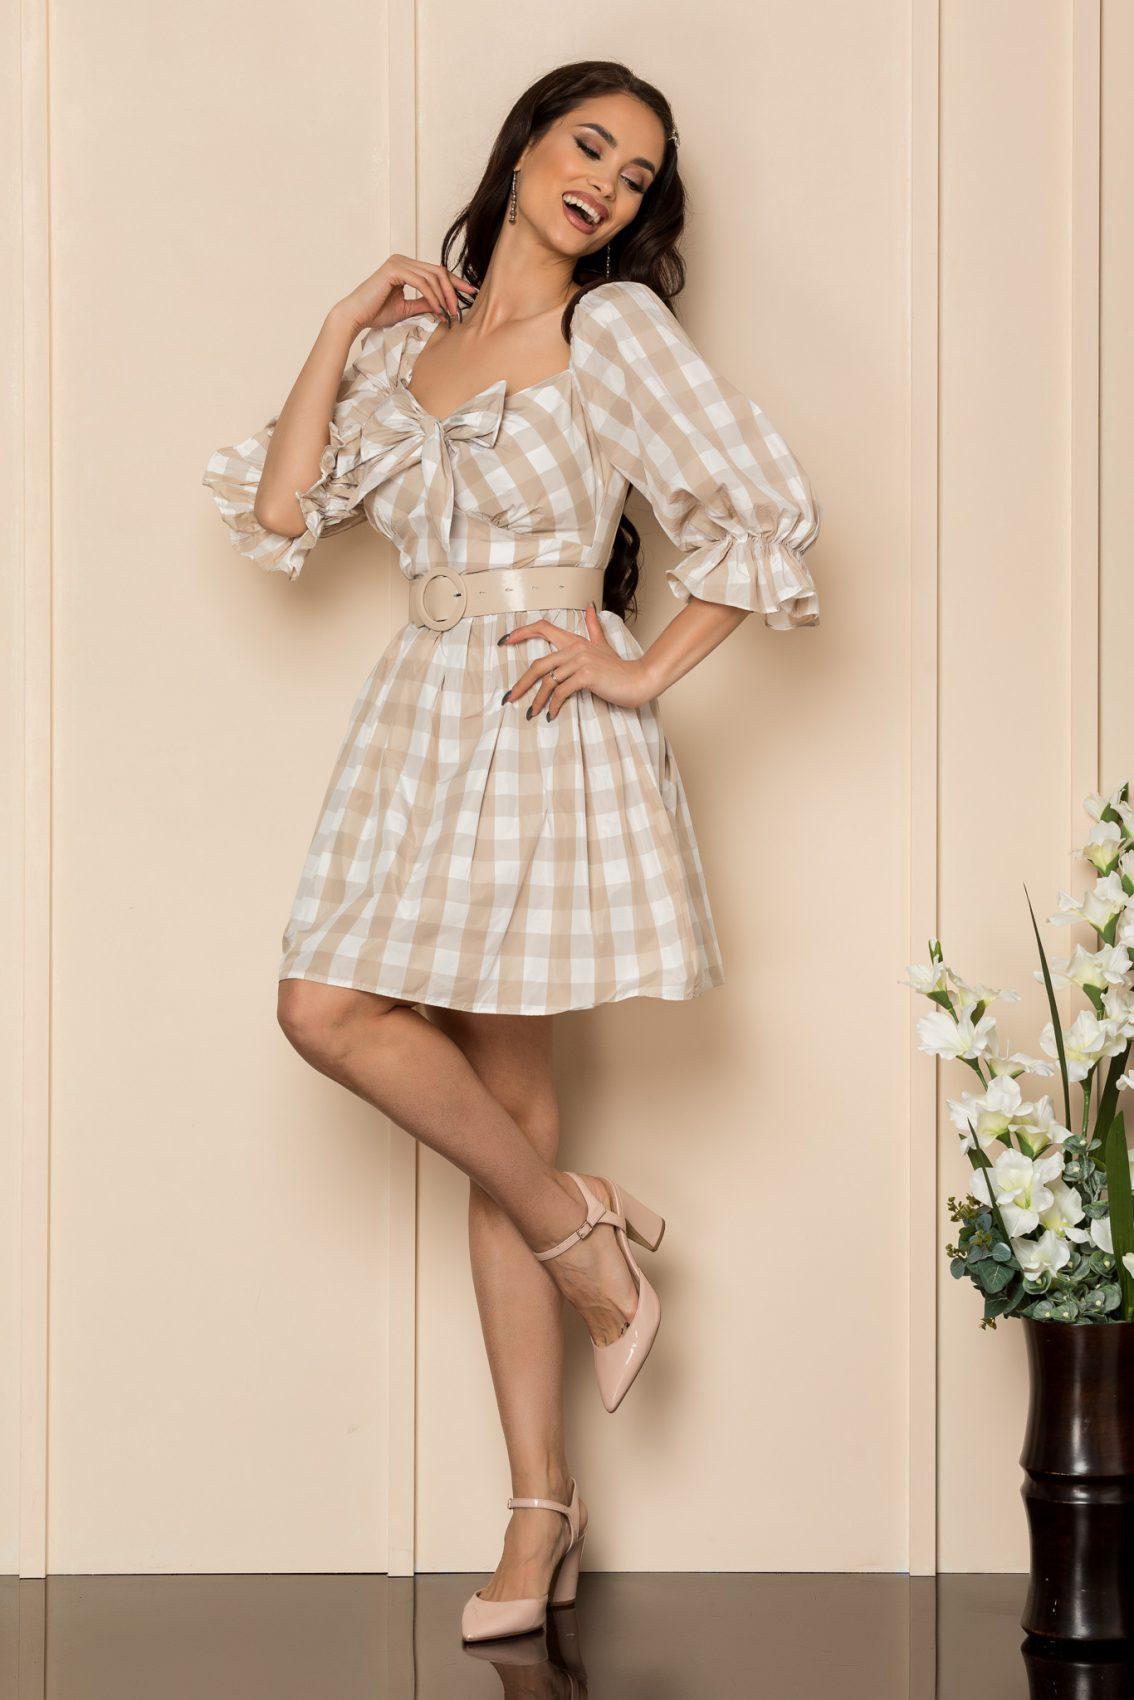 Nude Καρό Φόρεμα Mavis A430 1